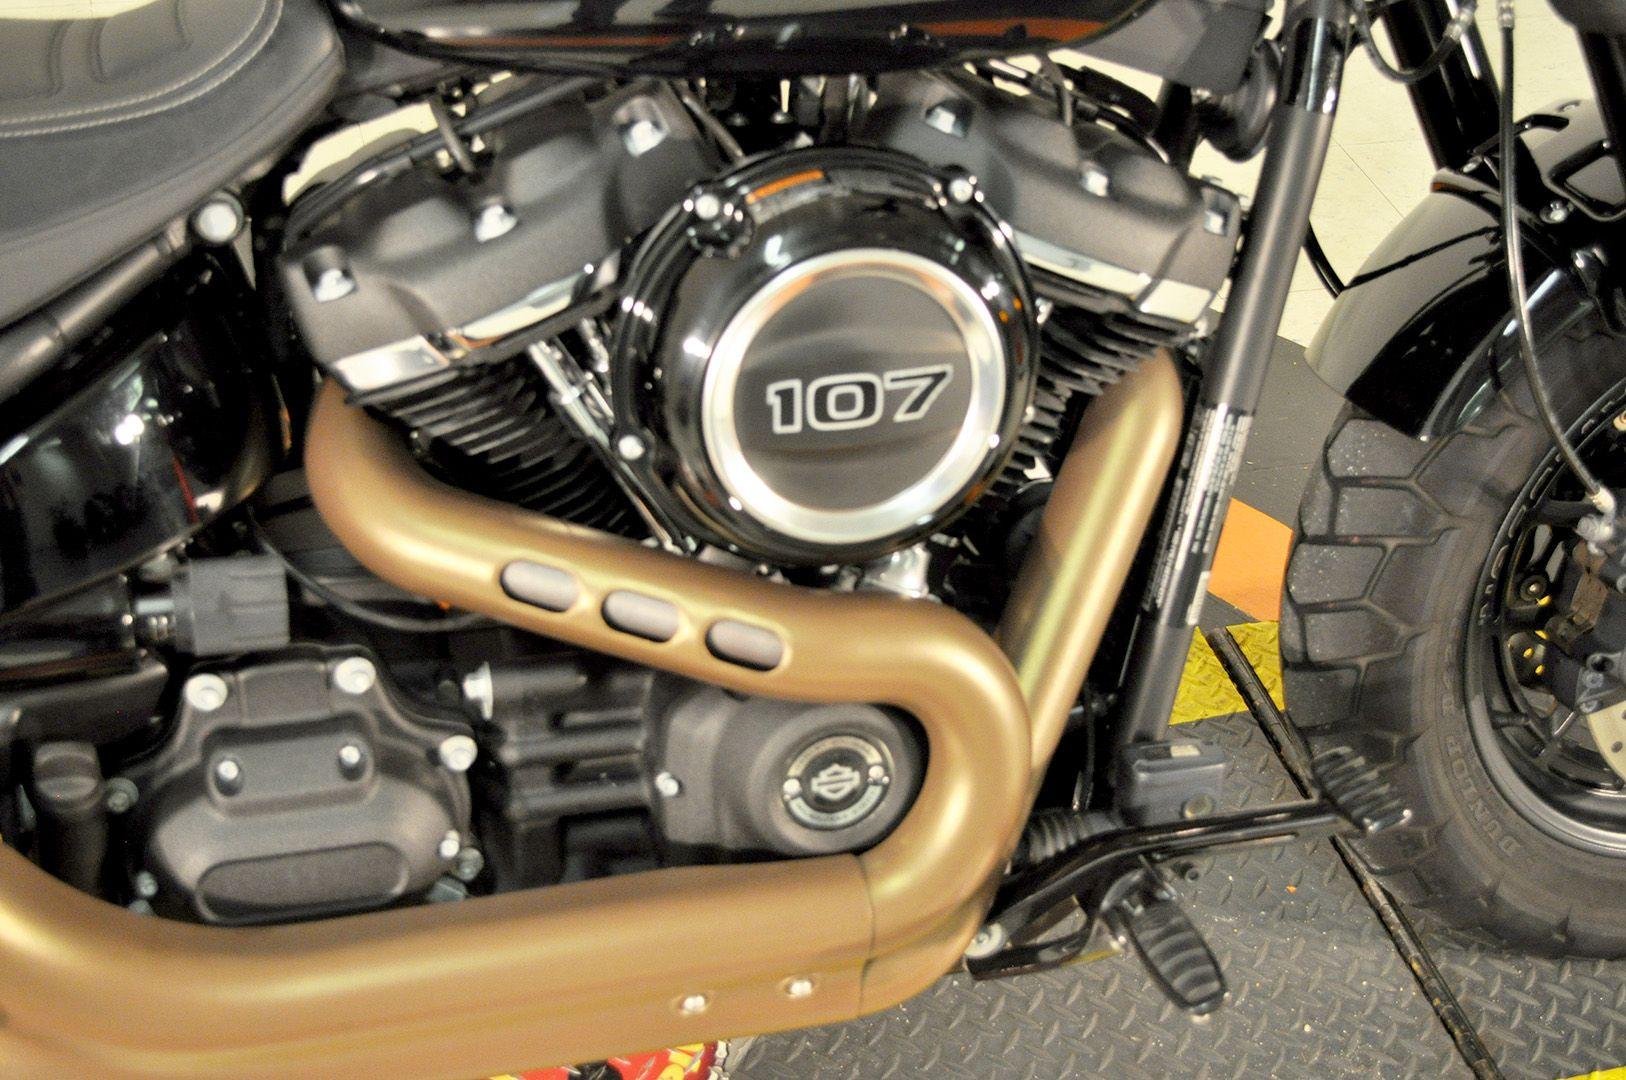 Pre-Owned 2019 Harley-Davidson Fat Bob